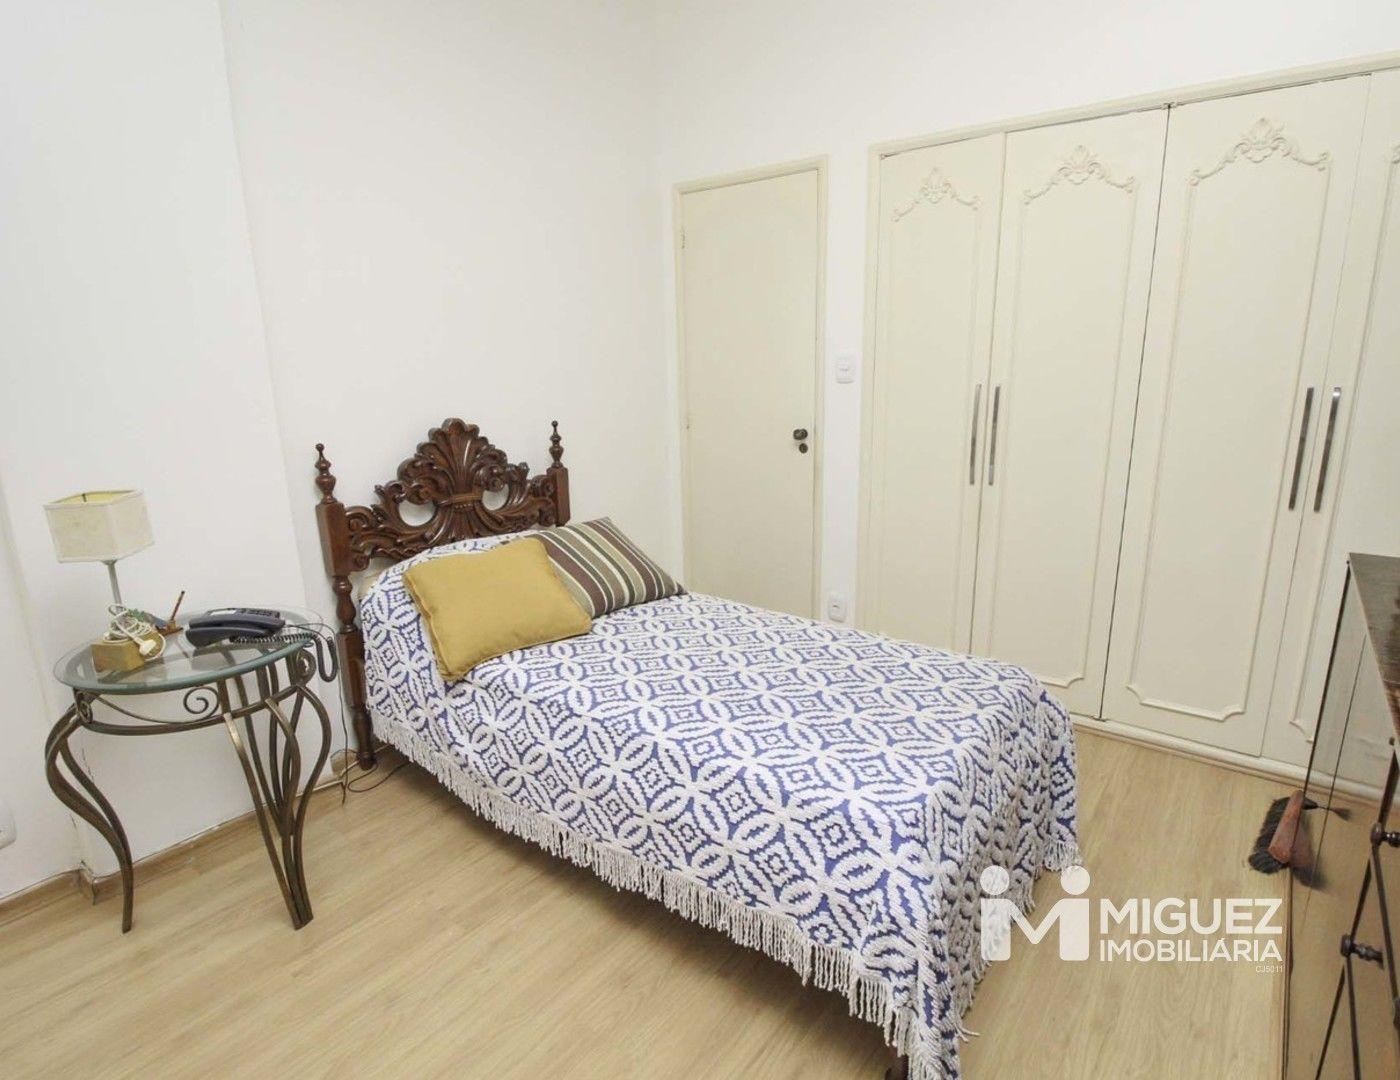 Apartamento, aluguel, Rua Doutor Satamini - Tijuca , Rio de janeiro